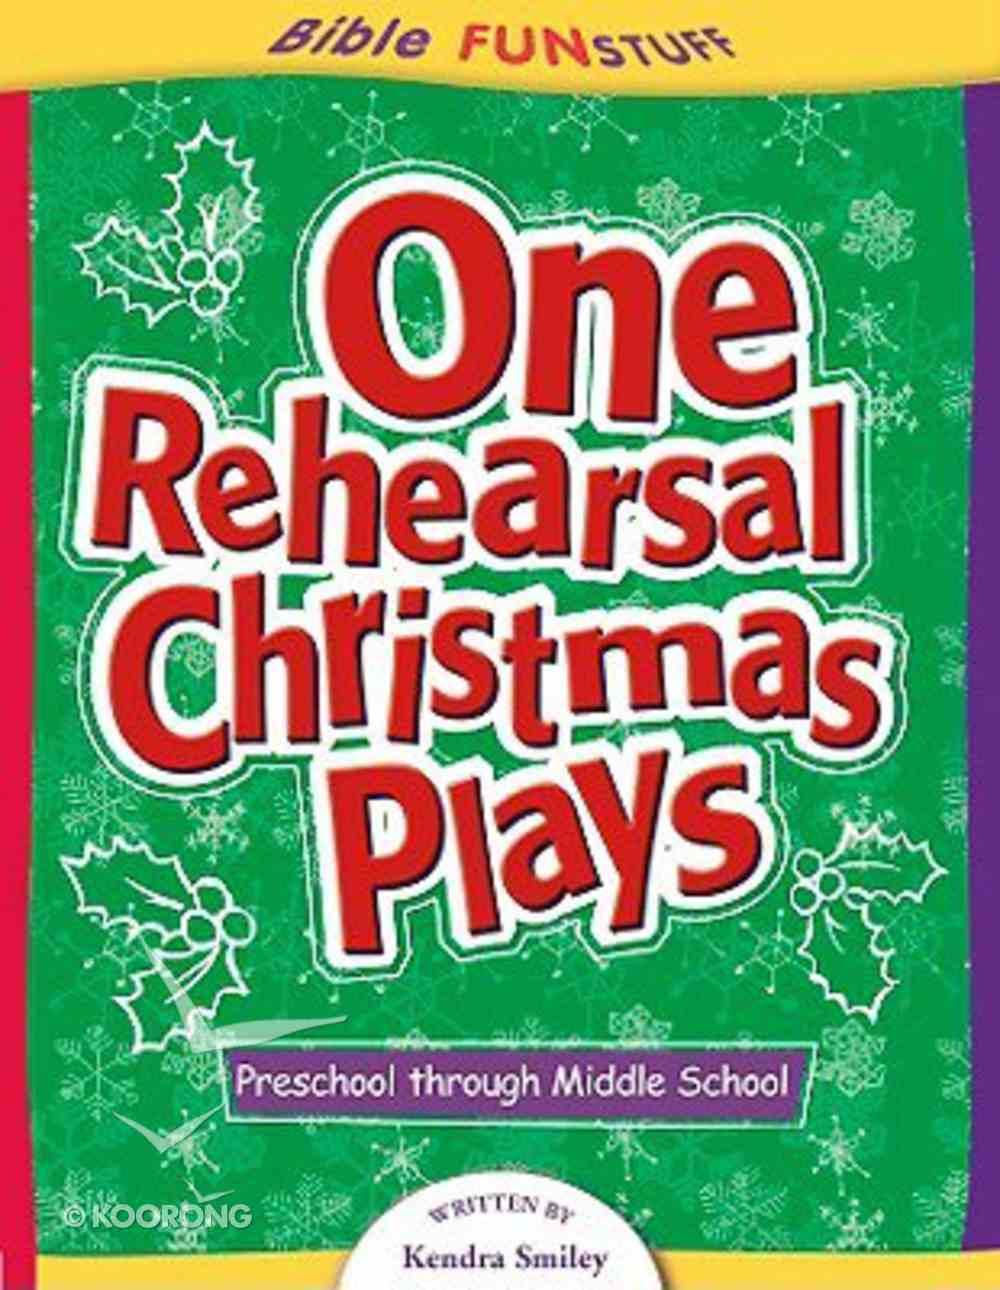 One Rehearsal Christmas Plays (Bible Fun Stuff Series) Paperback